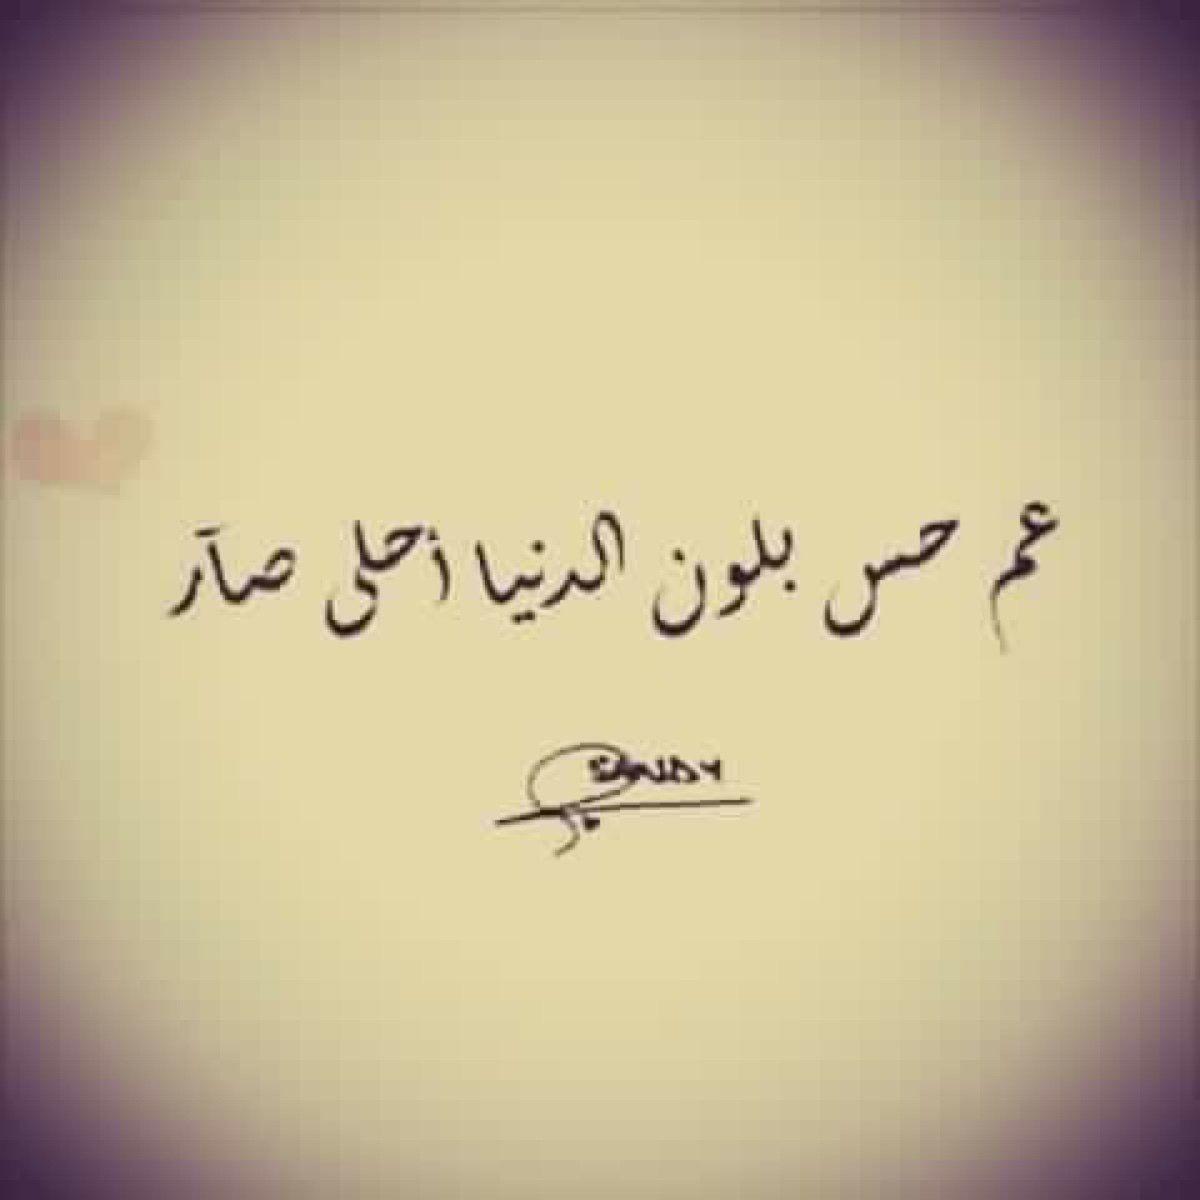 عم عيش نهار بألف نهار Songs Words Arabic Calligraphy